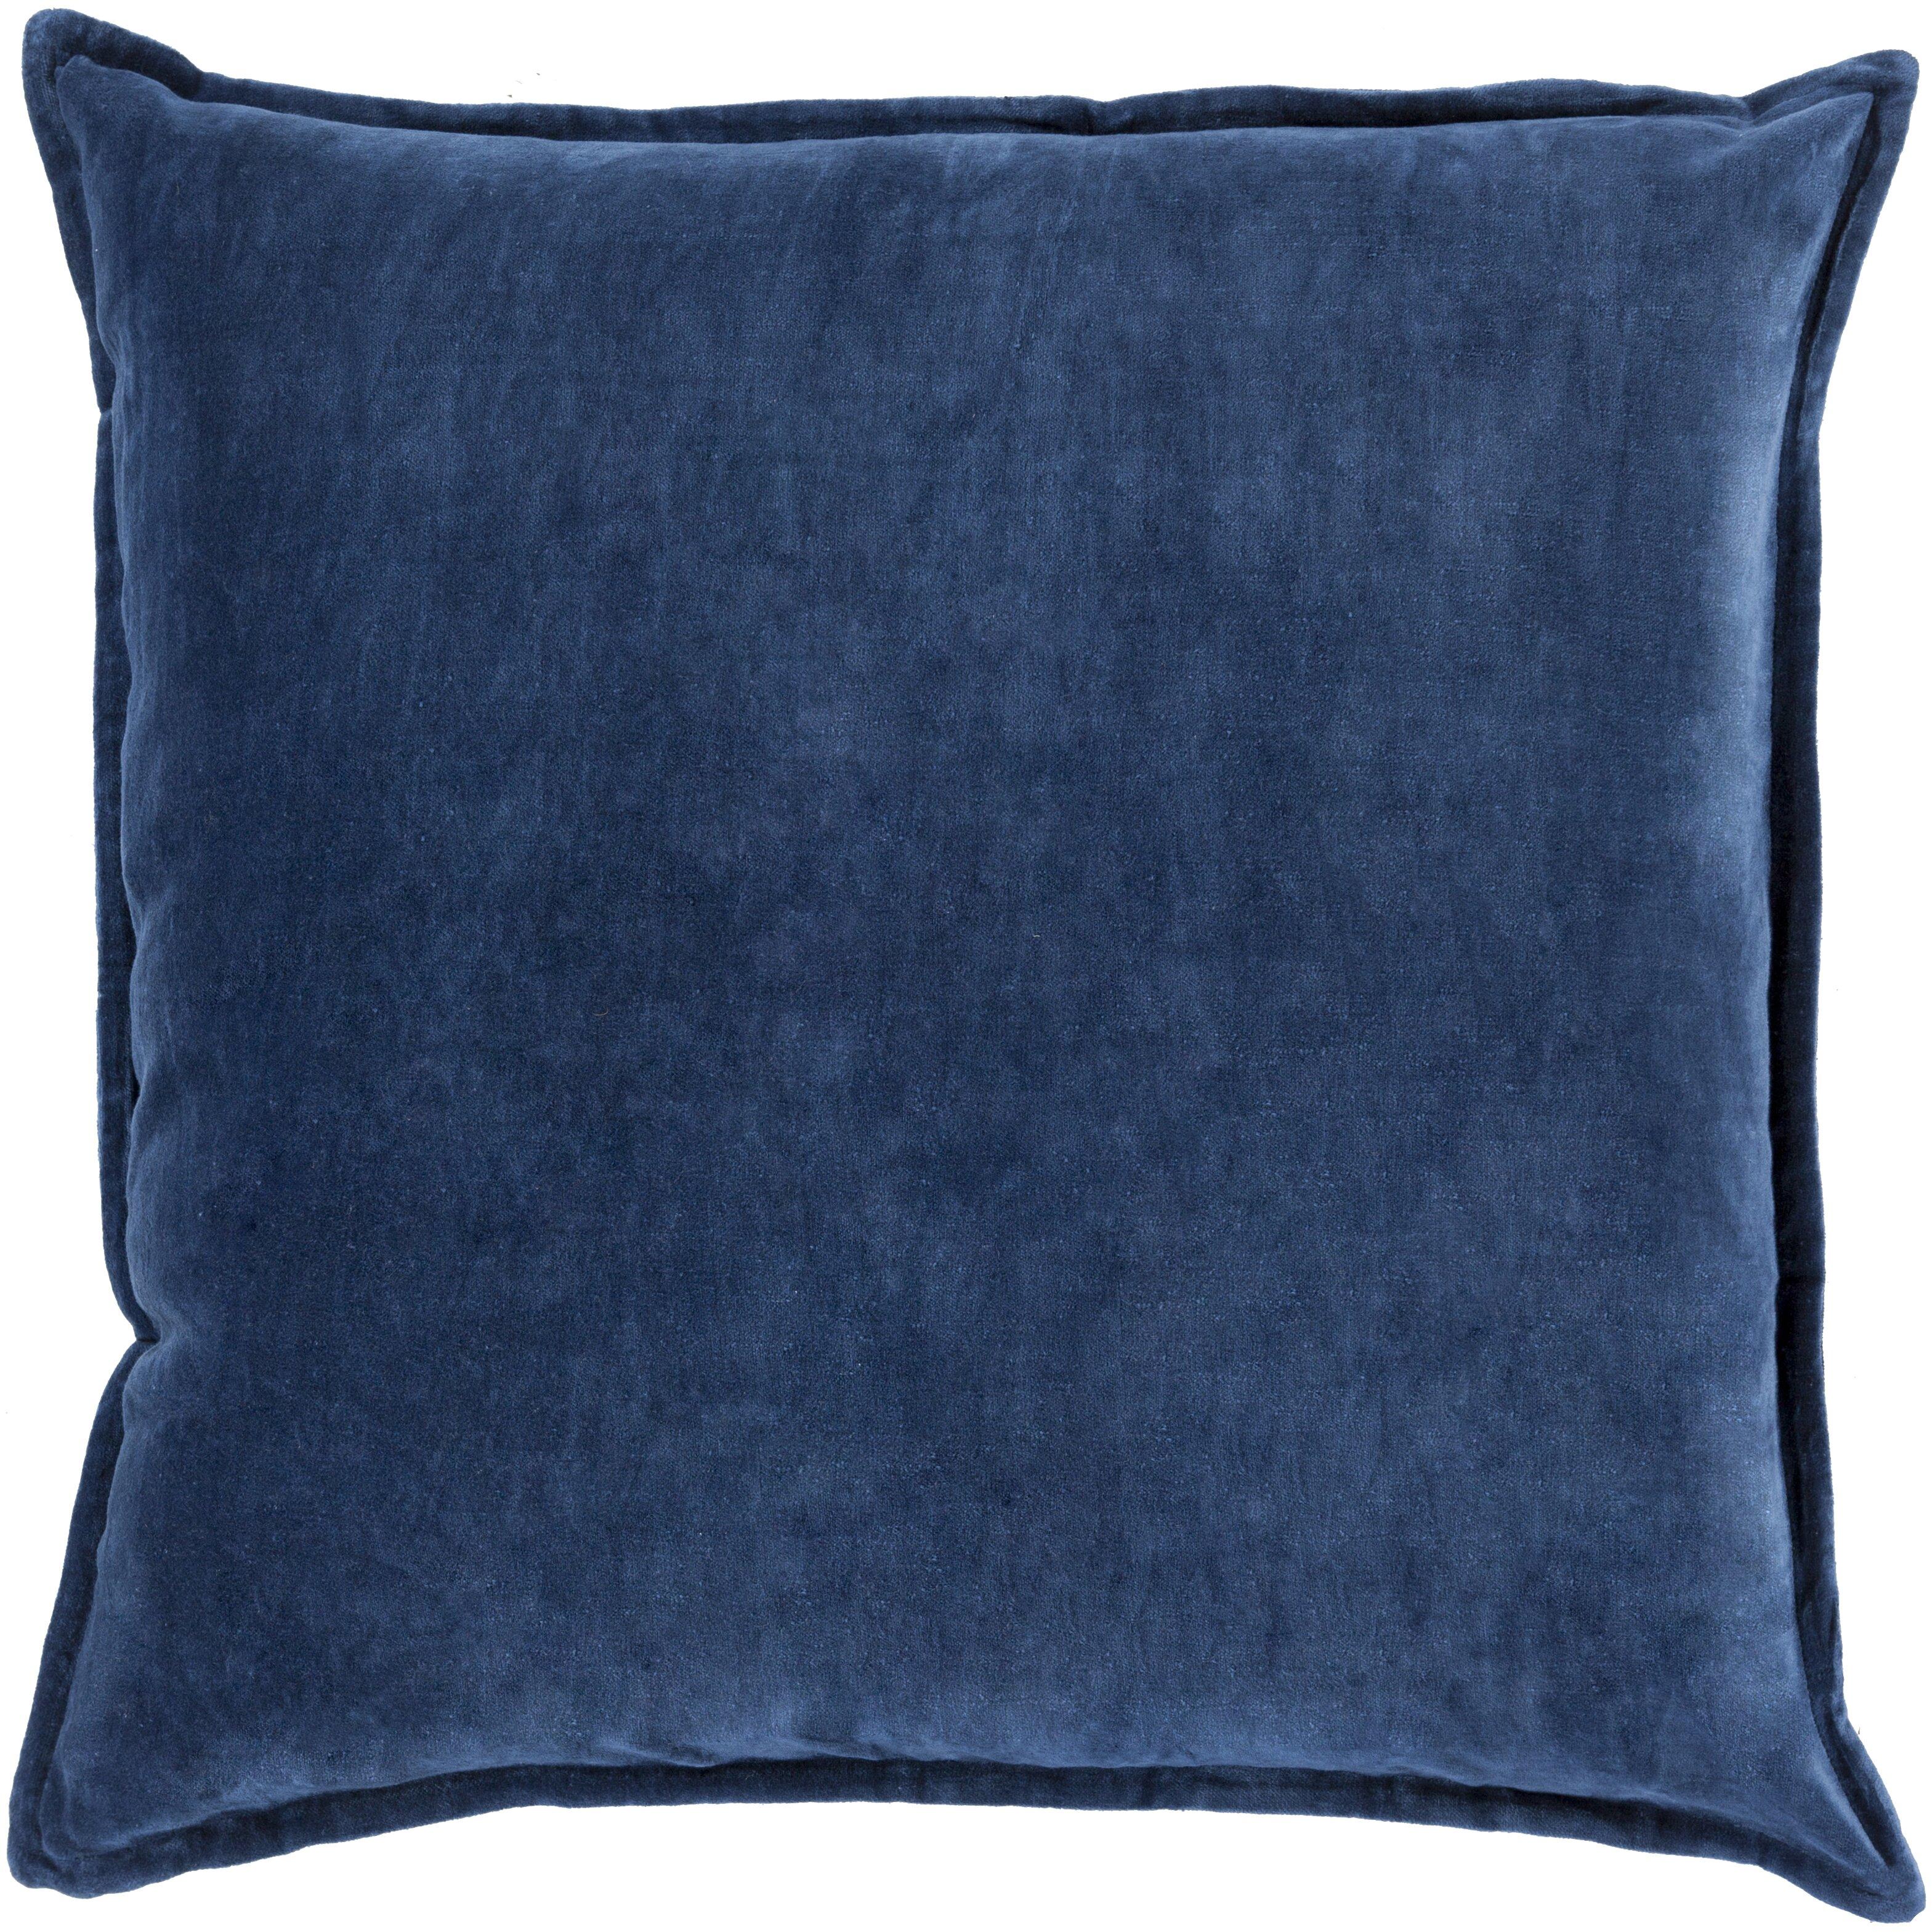 Askern smooth velvet cotton throw pillow wayfair for Buy hampton inn pillows